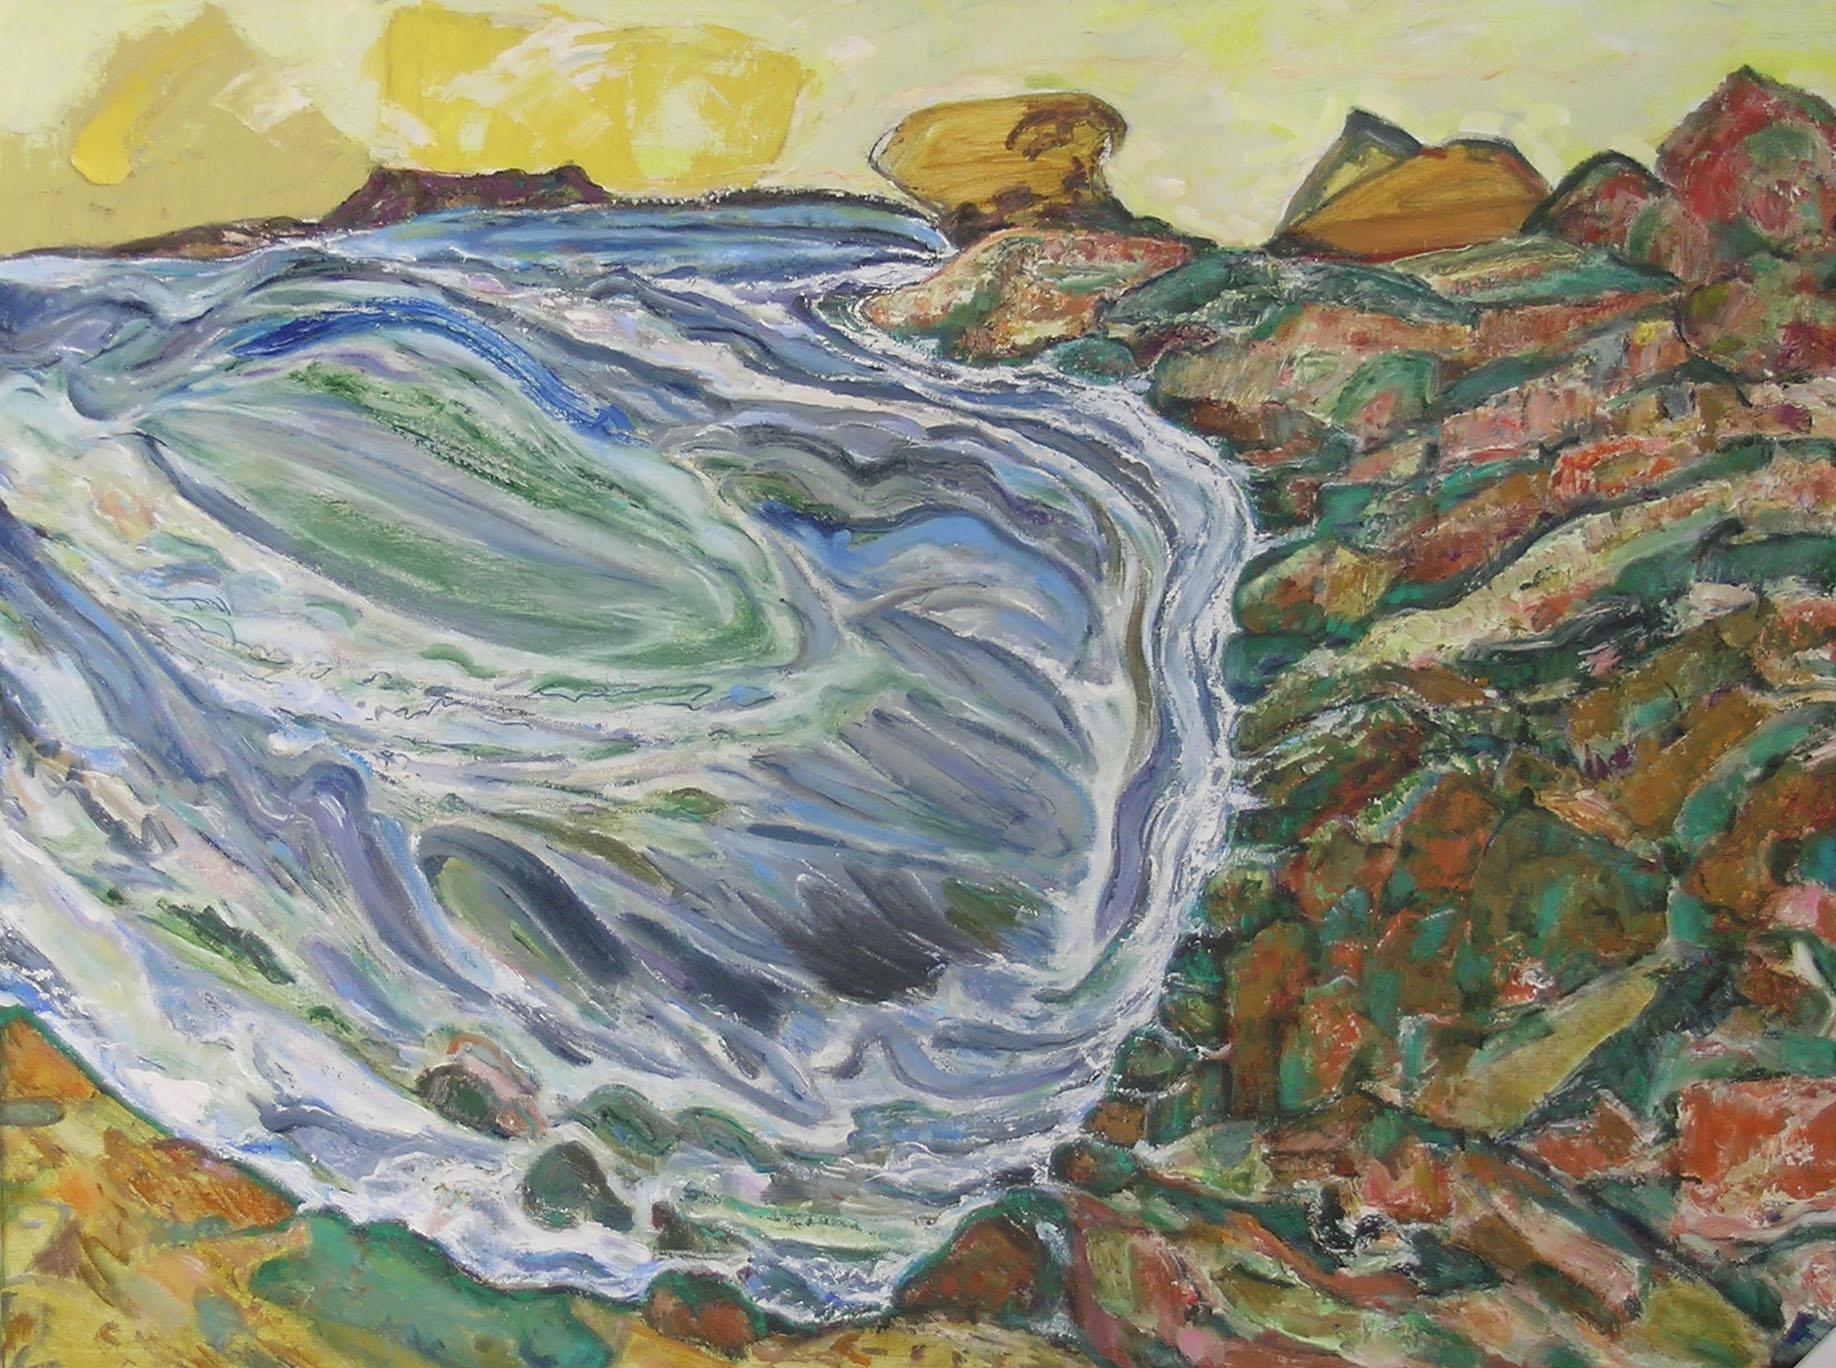 Wave II, 2005 oil canvas, 30 x 40 inche